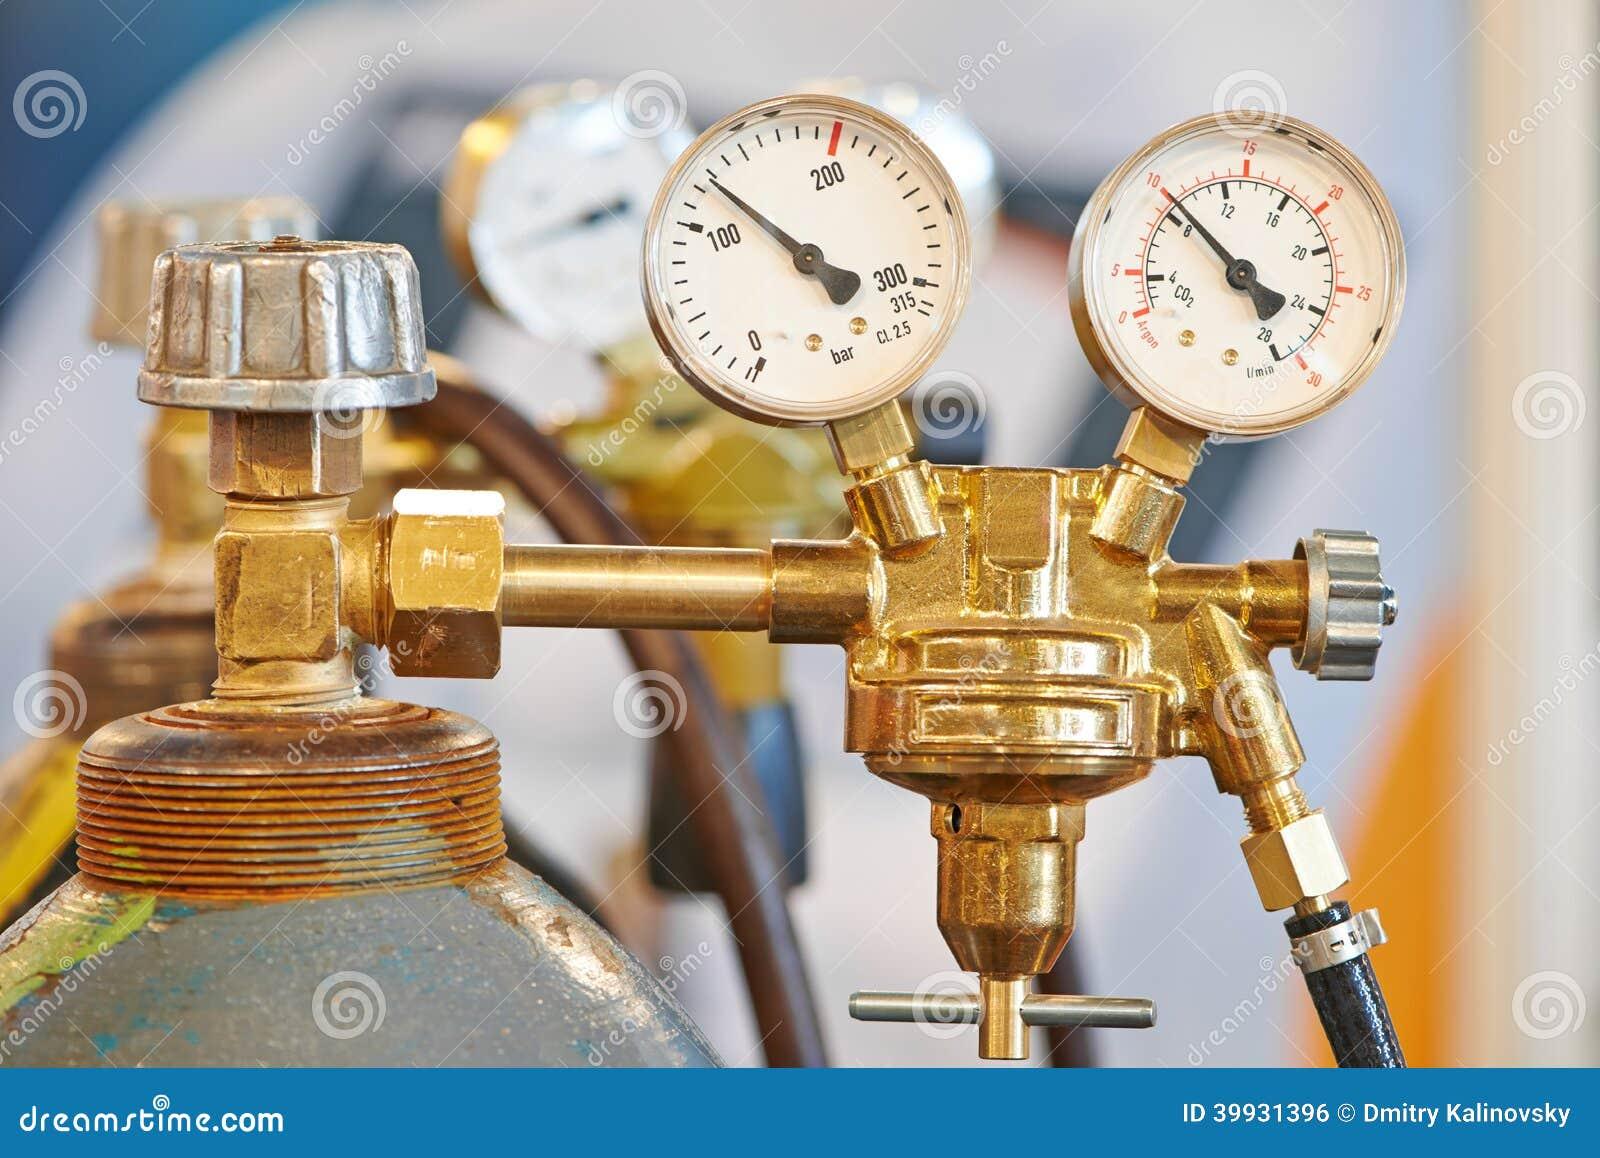 Welding acetylene gas cylinder tank with gauge stock photo